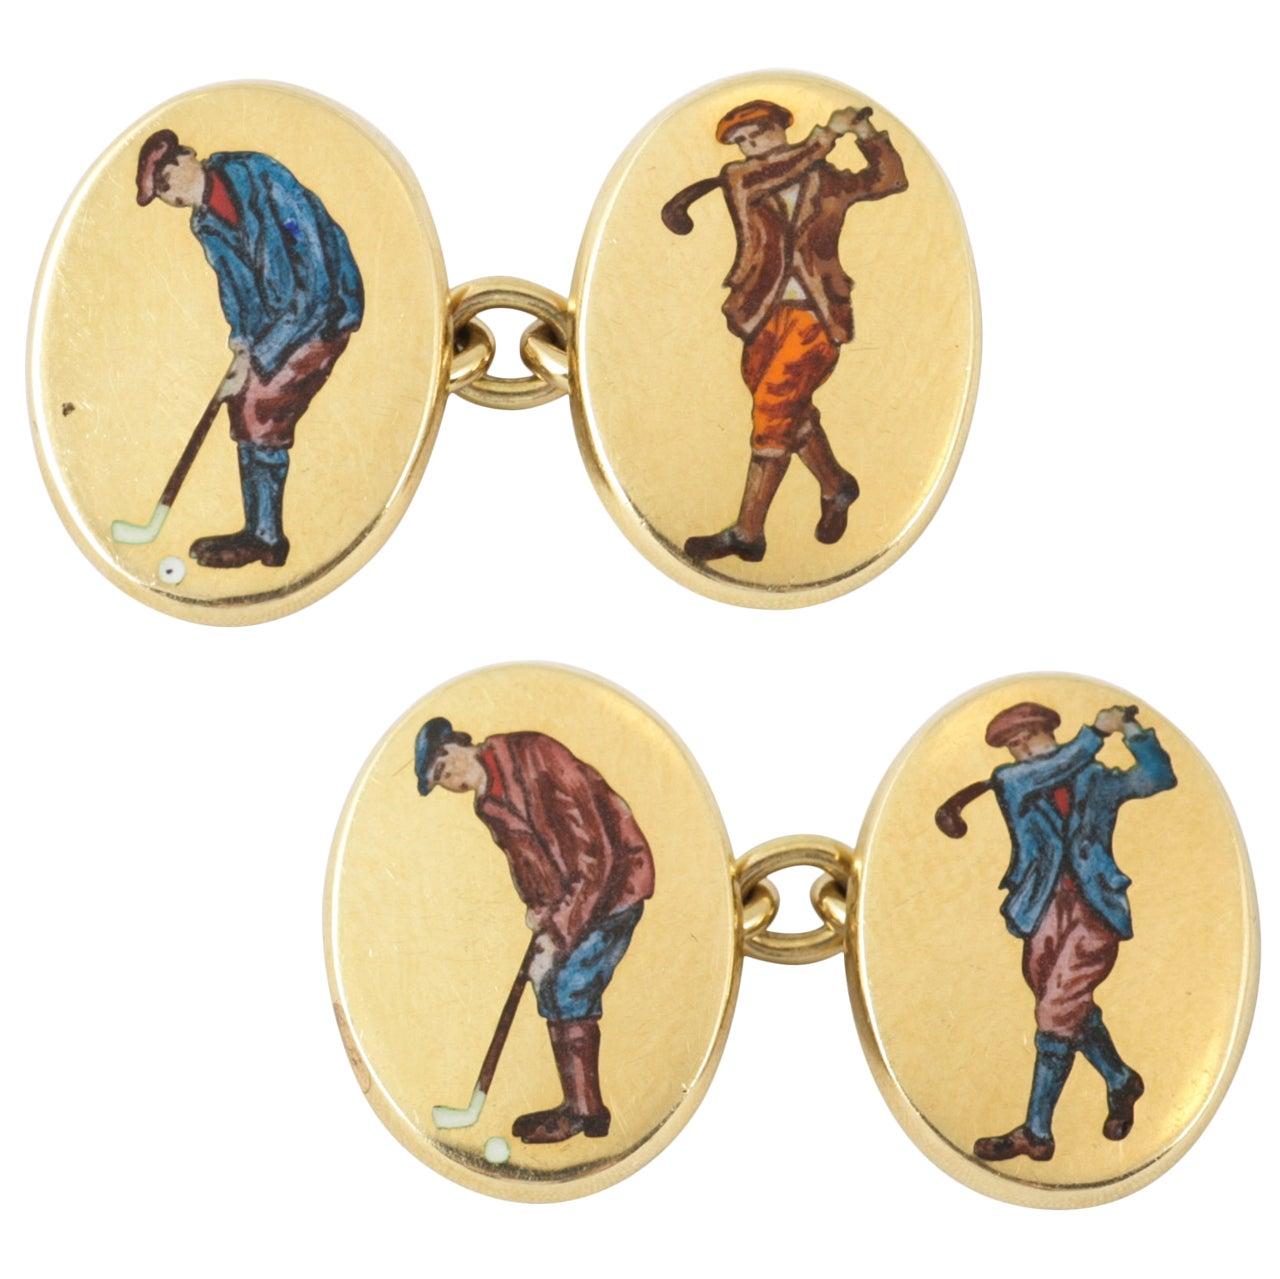 english oval gold golfer cufflinks at 1stdibs. Black Bedroom Furniture Sets. Home Design Ideas